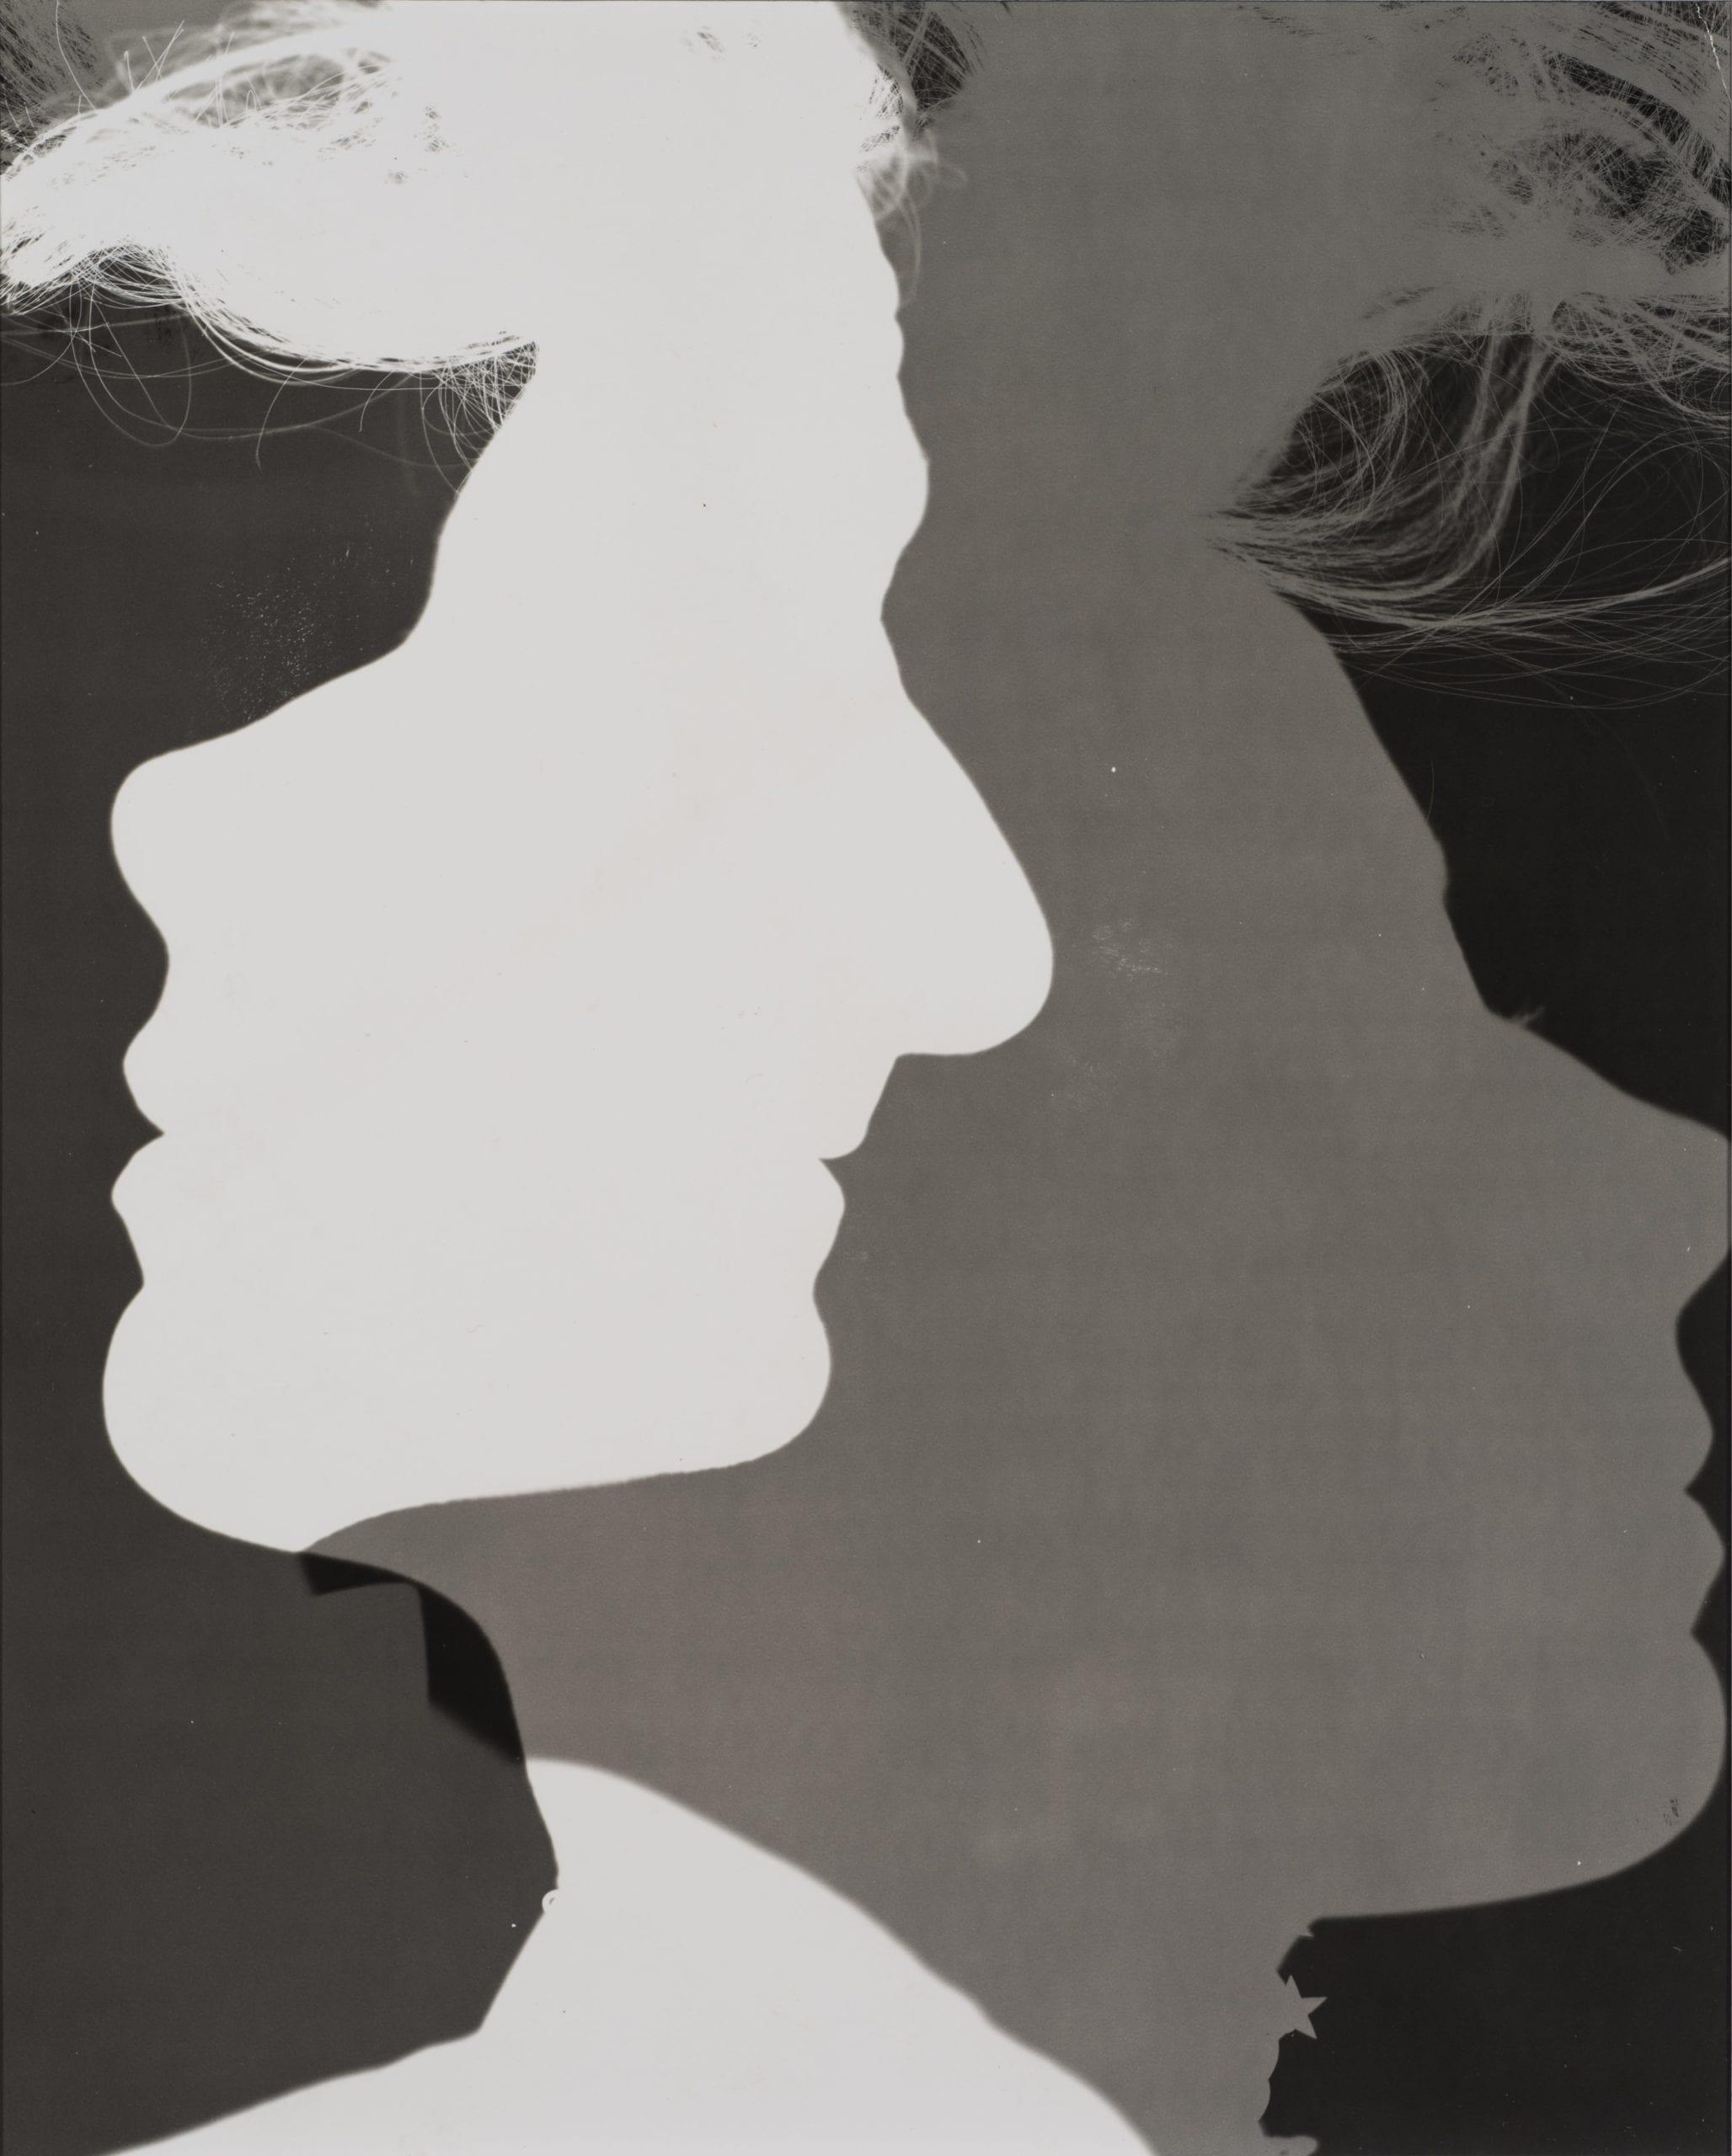 erwin-blumenfeld-shadowed-silhouettes-1953-silver-gelatin-print-courtesy-osborne-samuel